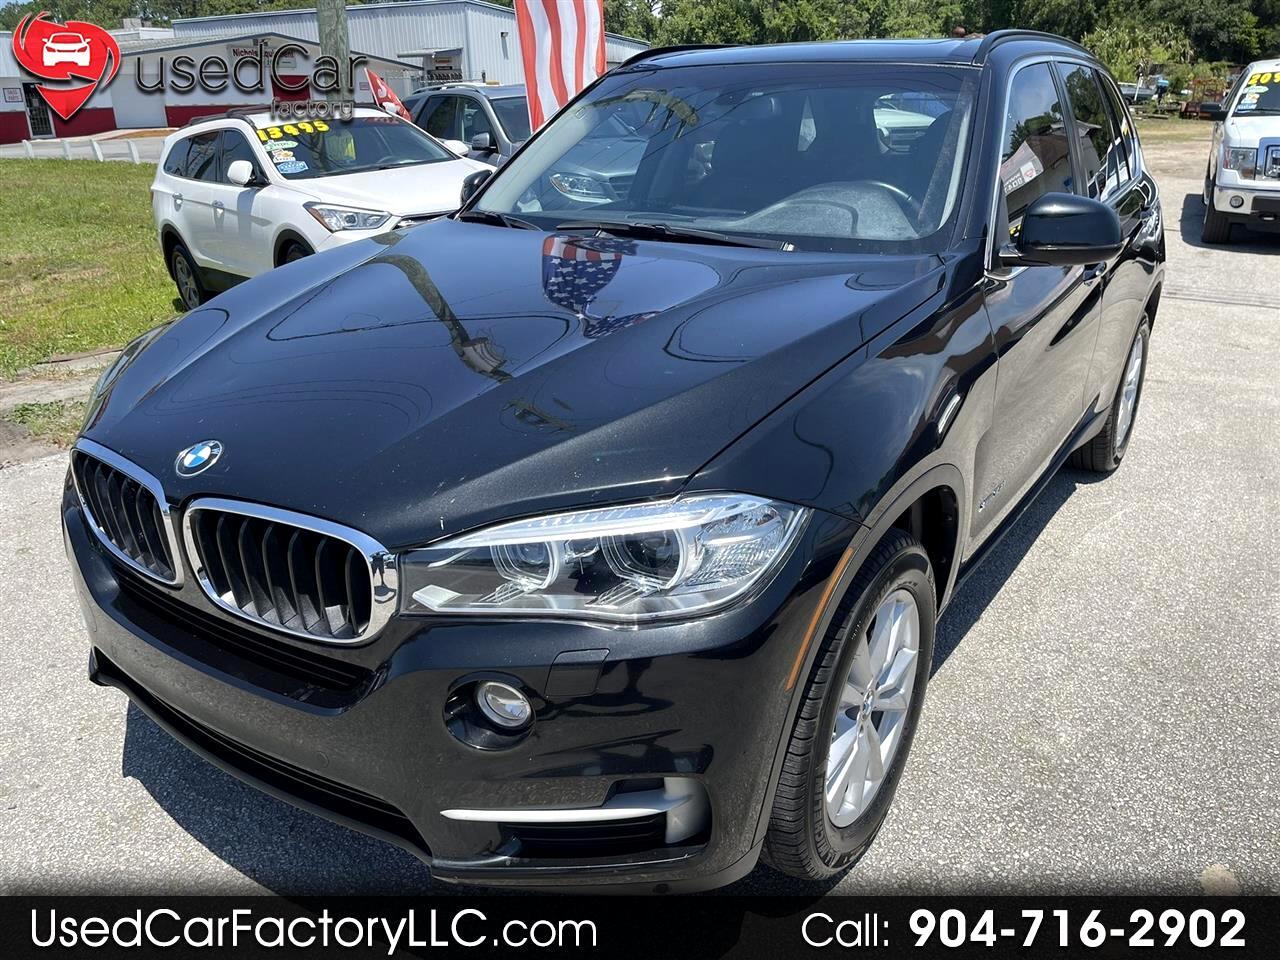 BMW X5 xDrive35id 2014